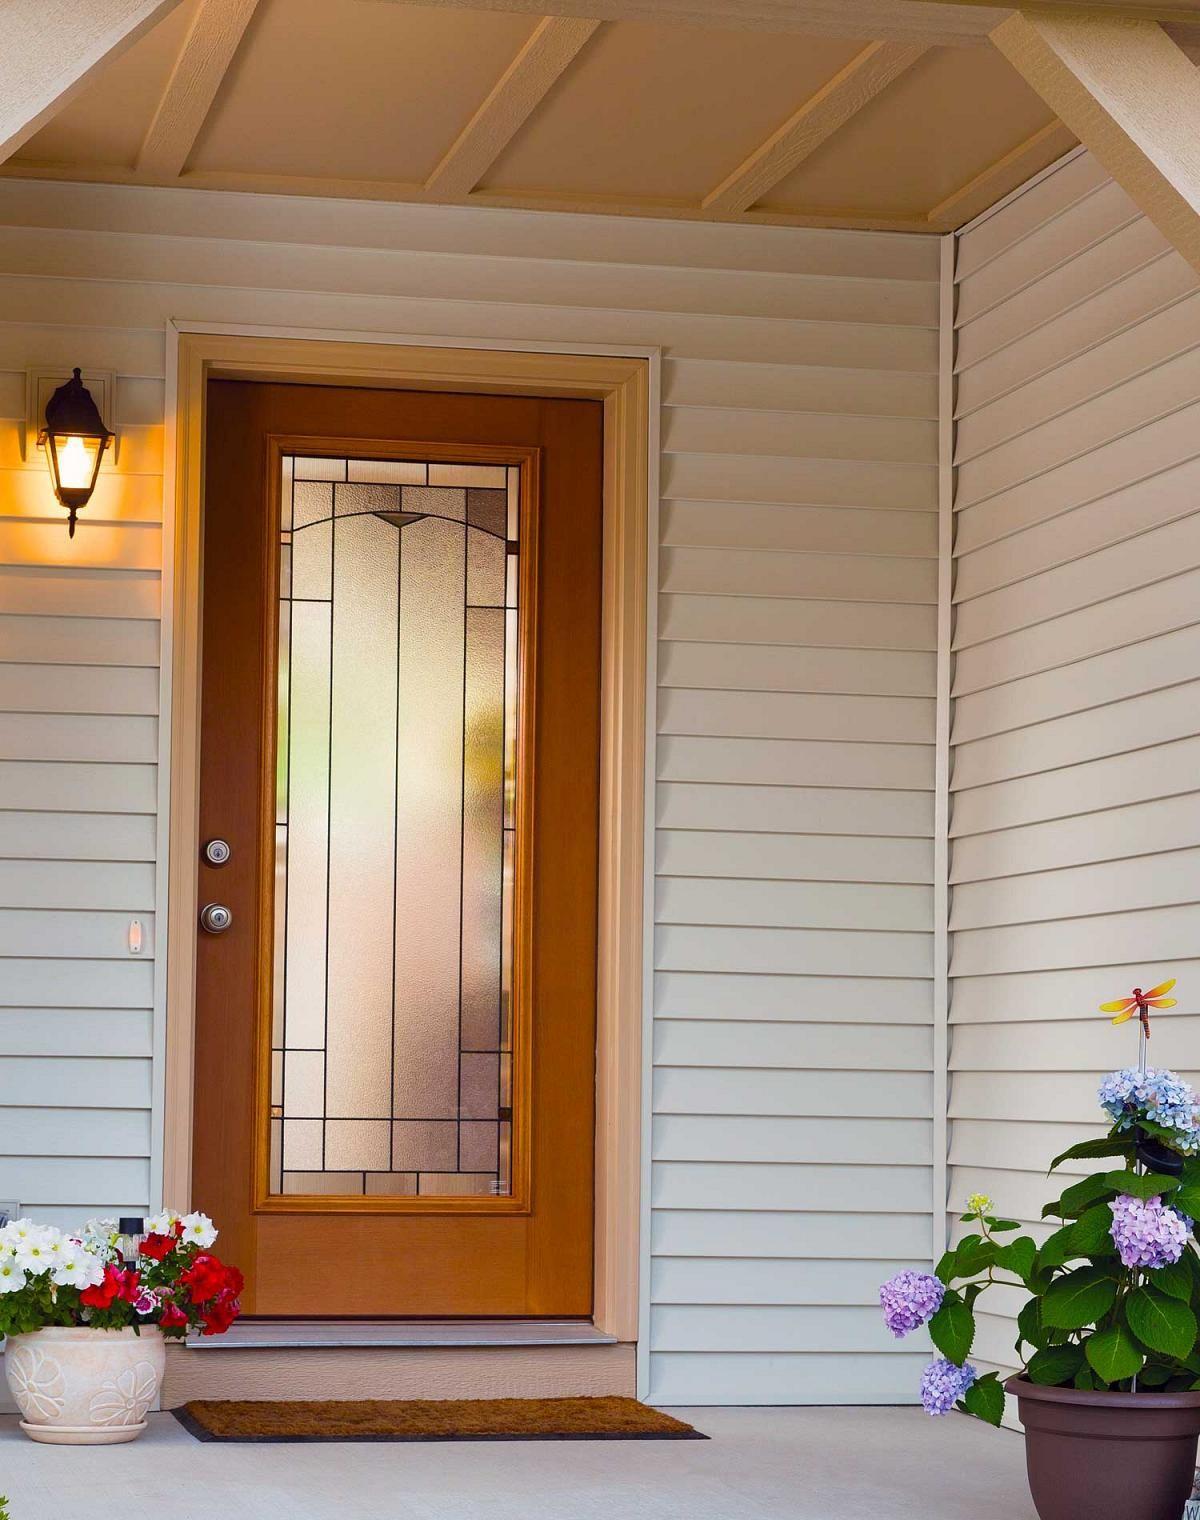 Odl Topaz Decorative Door Glass Odl Pinterest Topaz Doors And